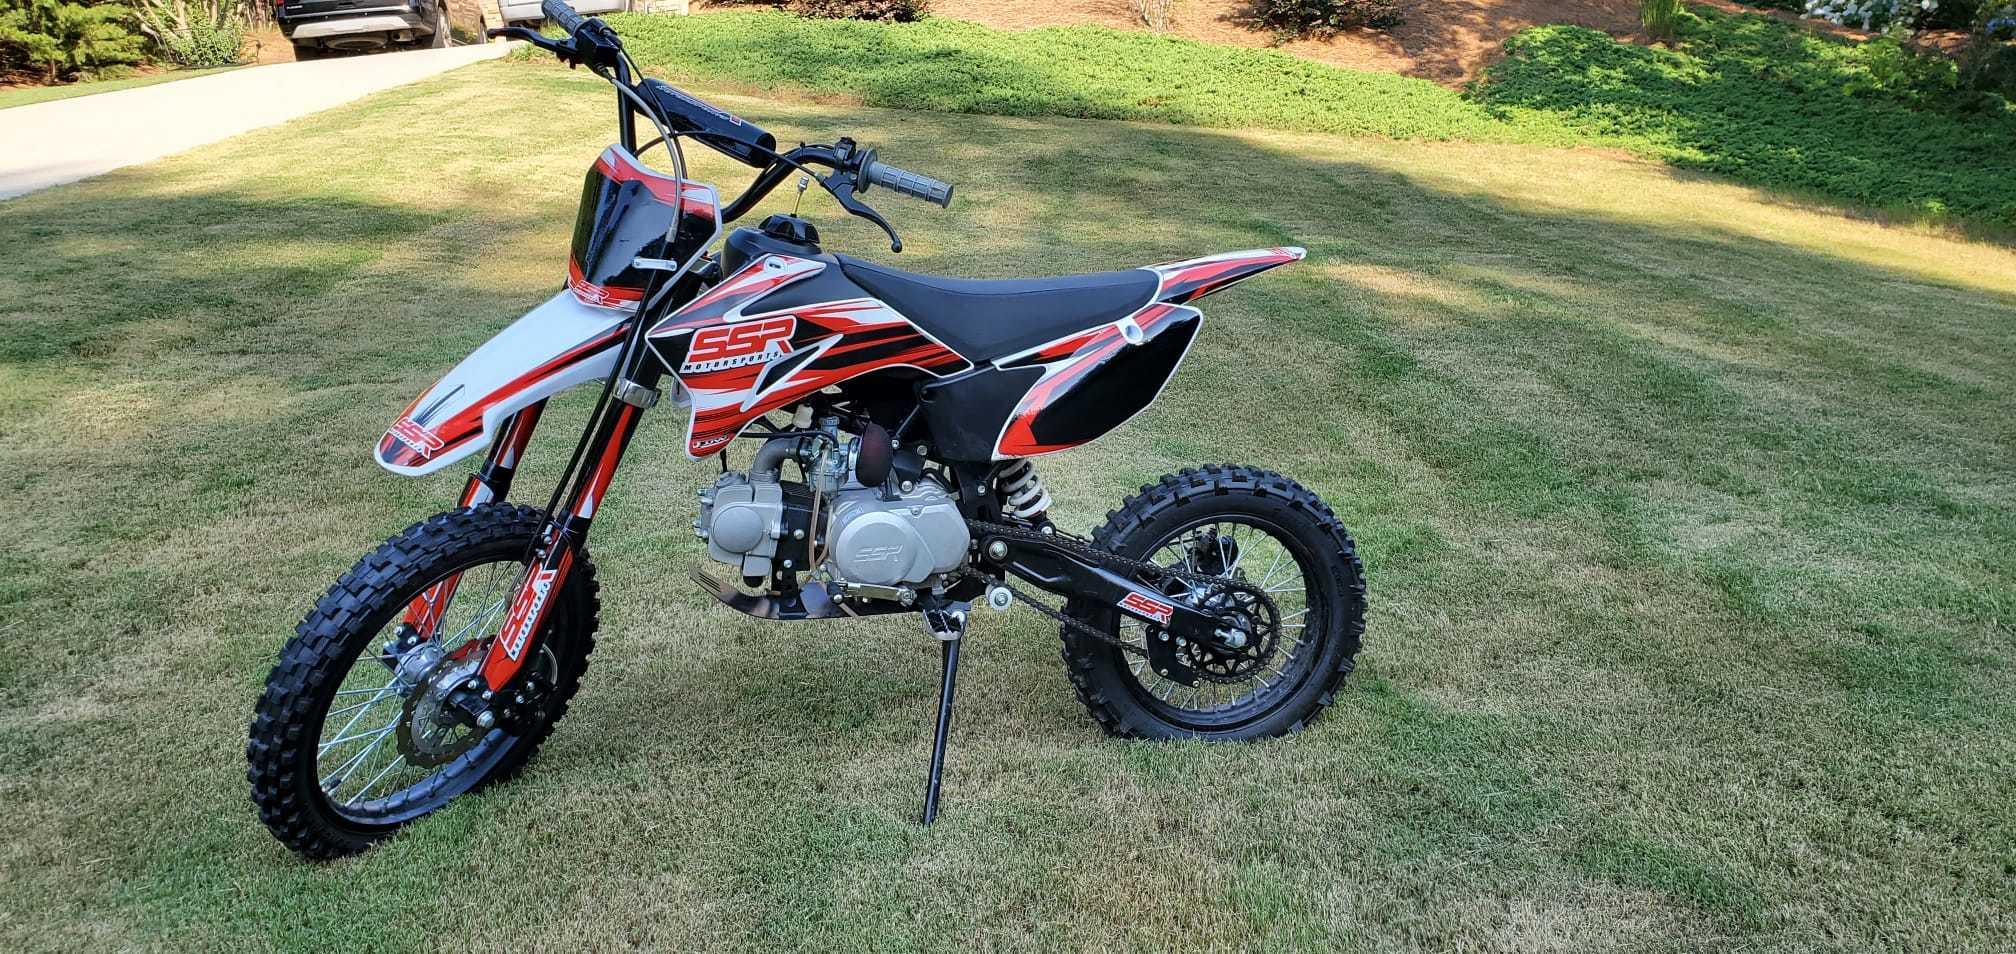 Photo Used 2020 Ssr Motorsports Dirt Bike Motorcycle  $1299